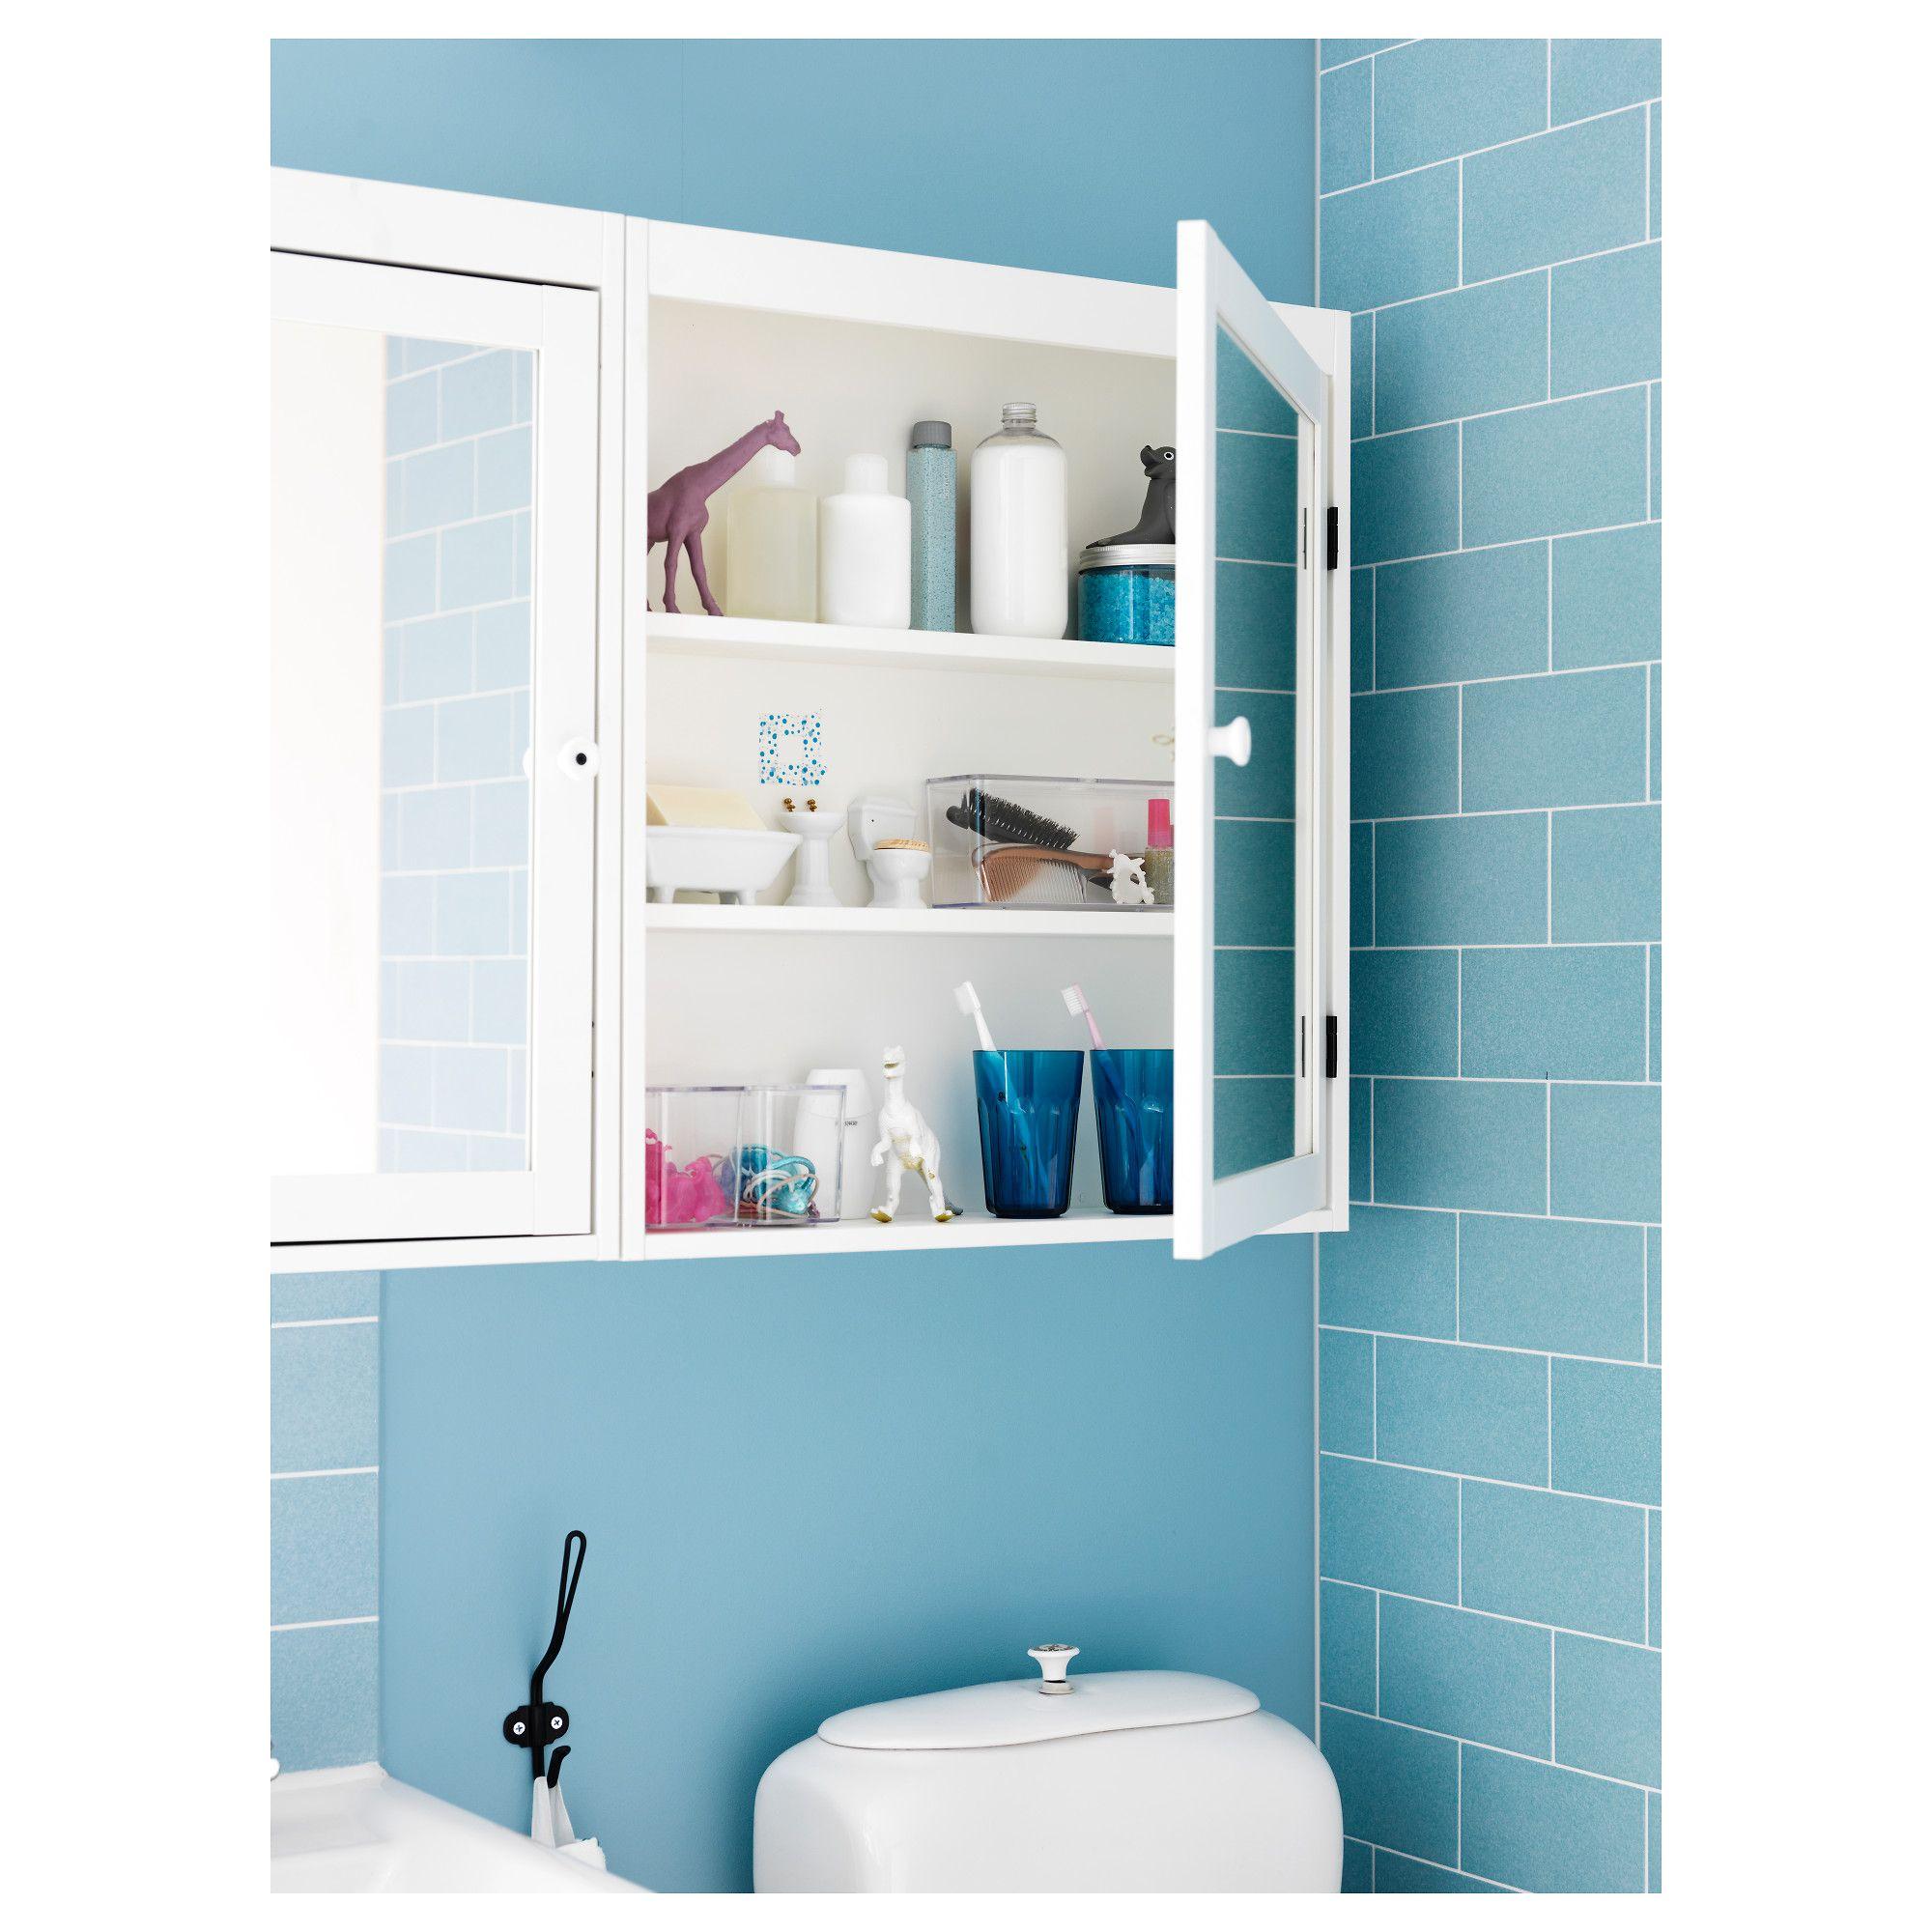 IKEA - SILVERÅN Mirror cabinet white | Mirror cabinets, Bathroom ...